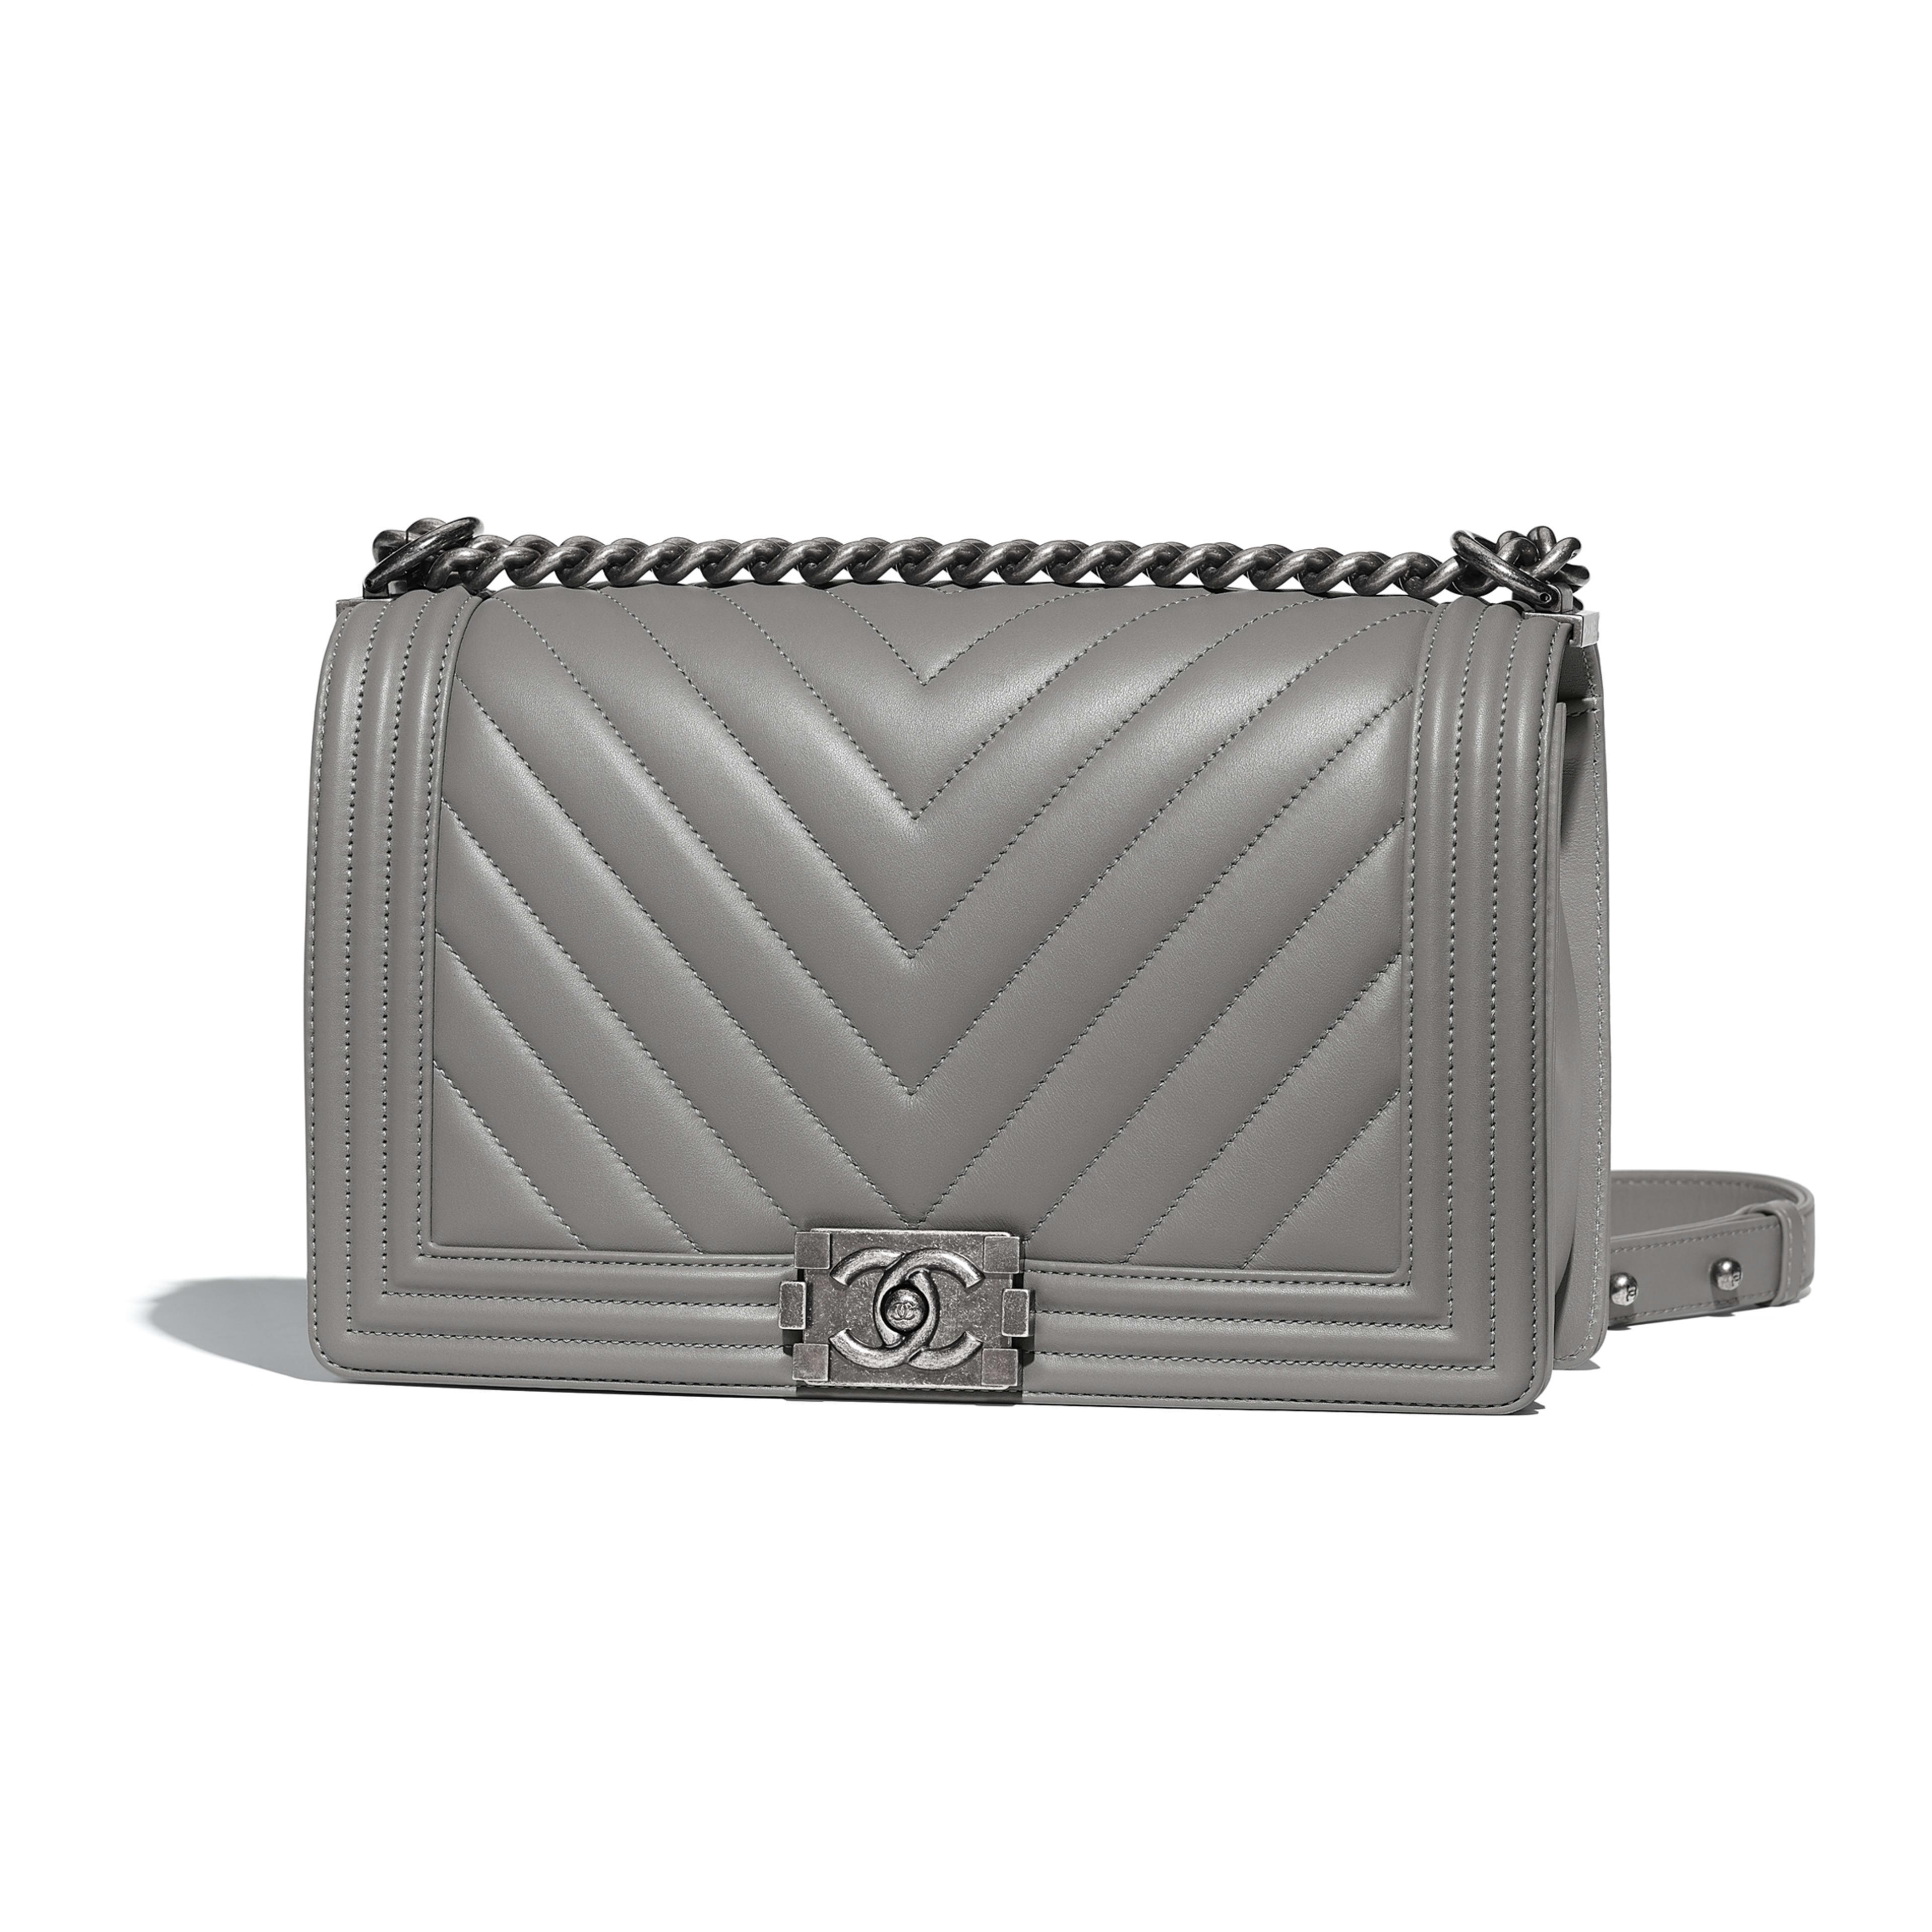 Large BOY CHANEL Handbag Calfskin & Ruthenium-Finish Metal Gray -                                  view 1 - see full sized version